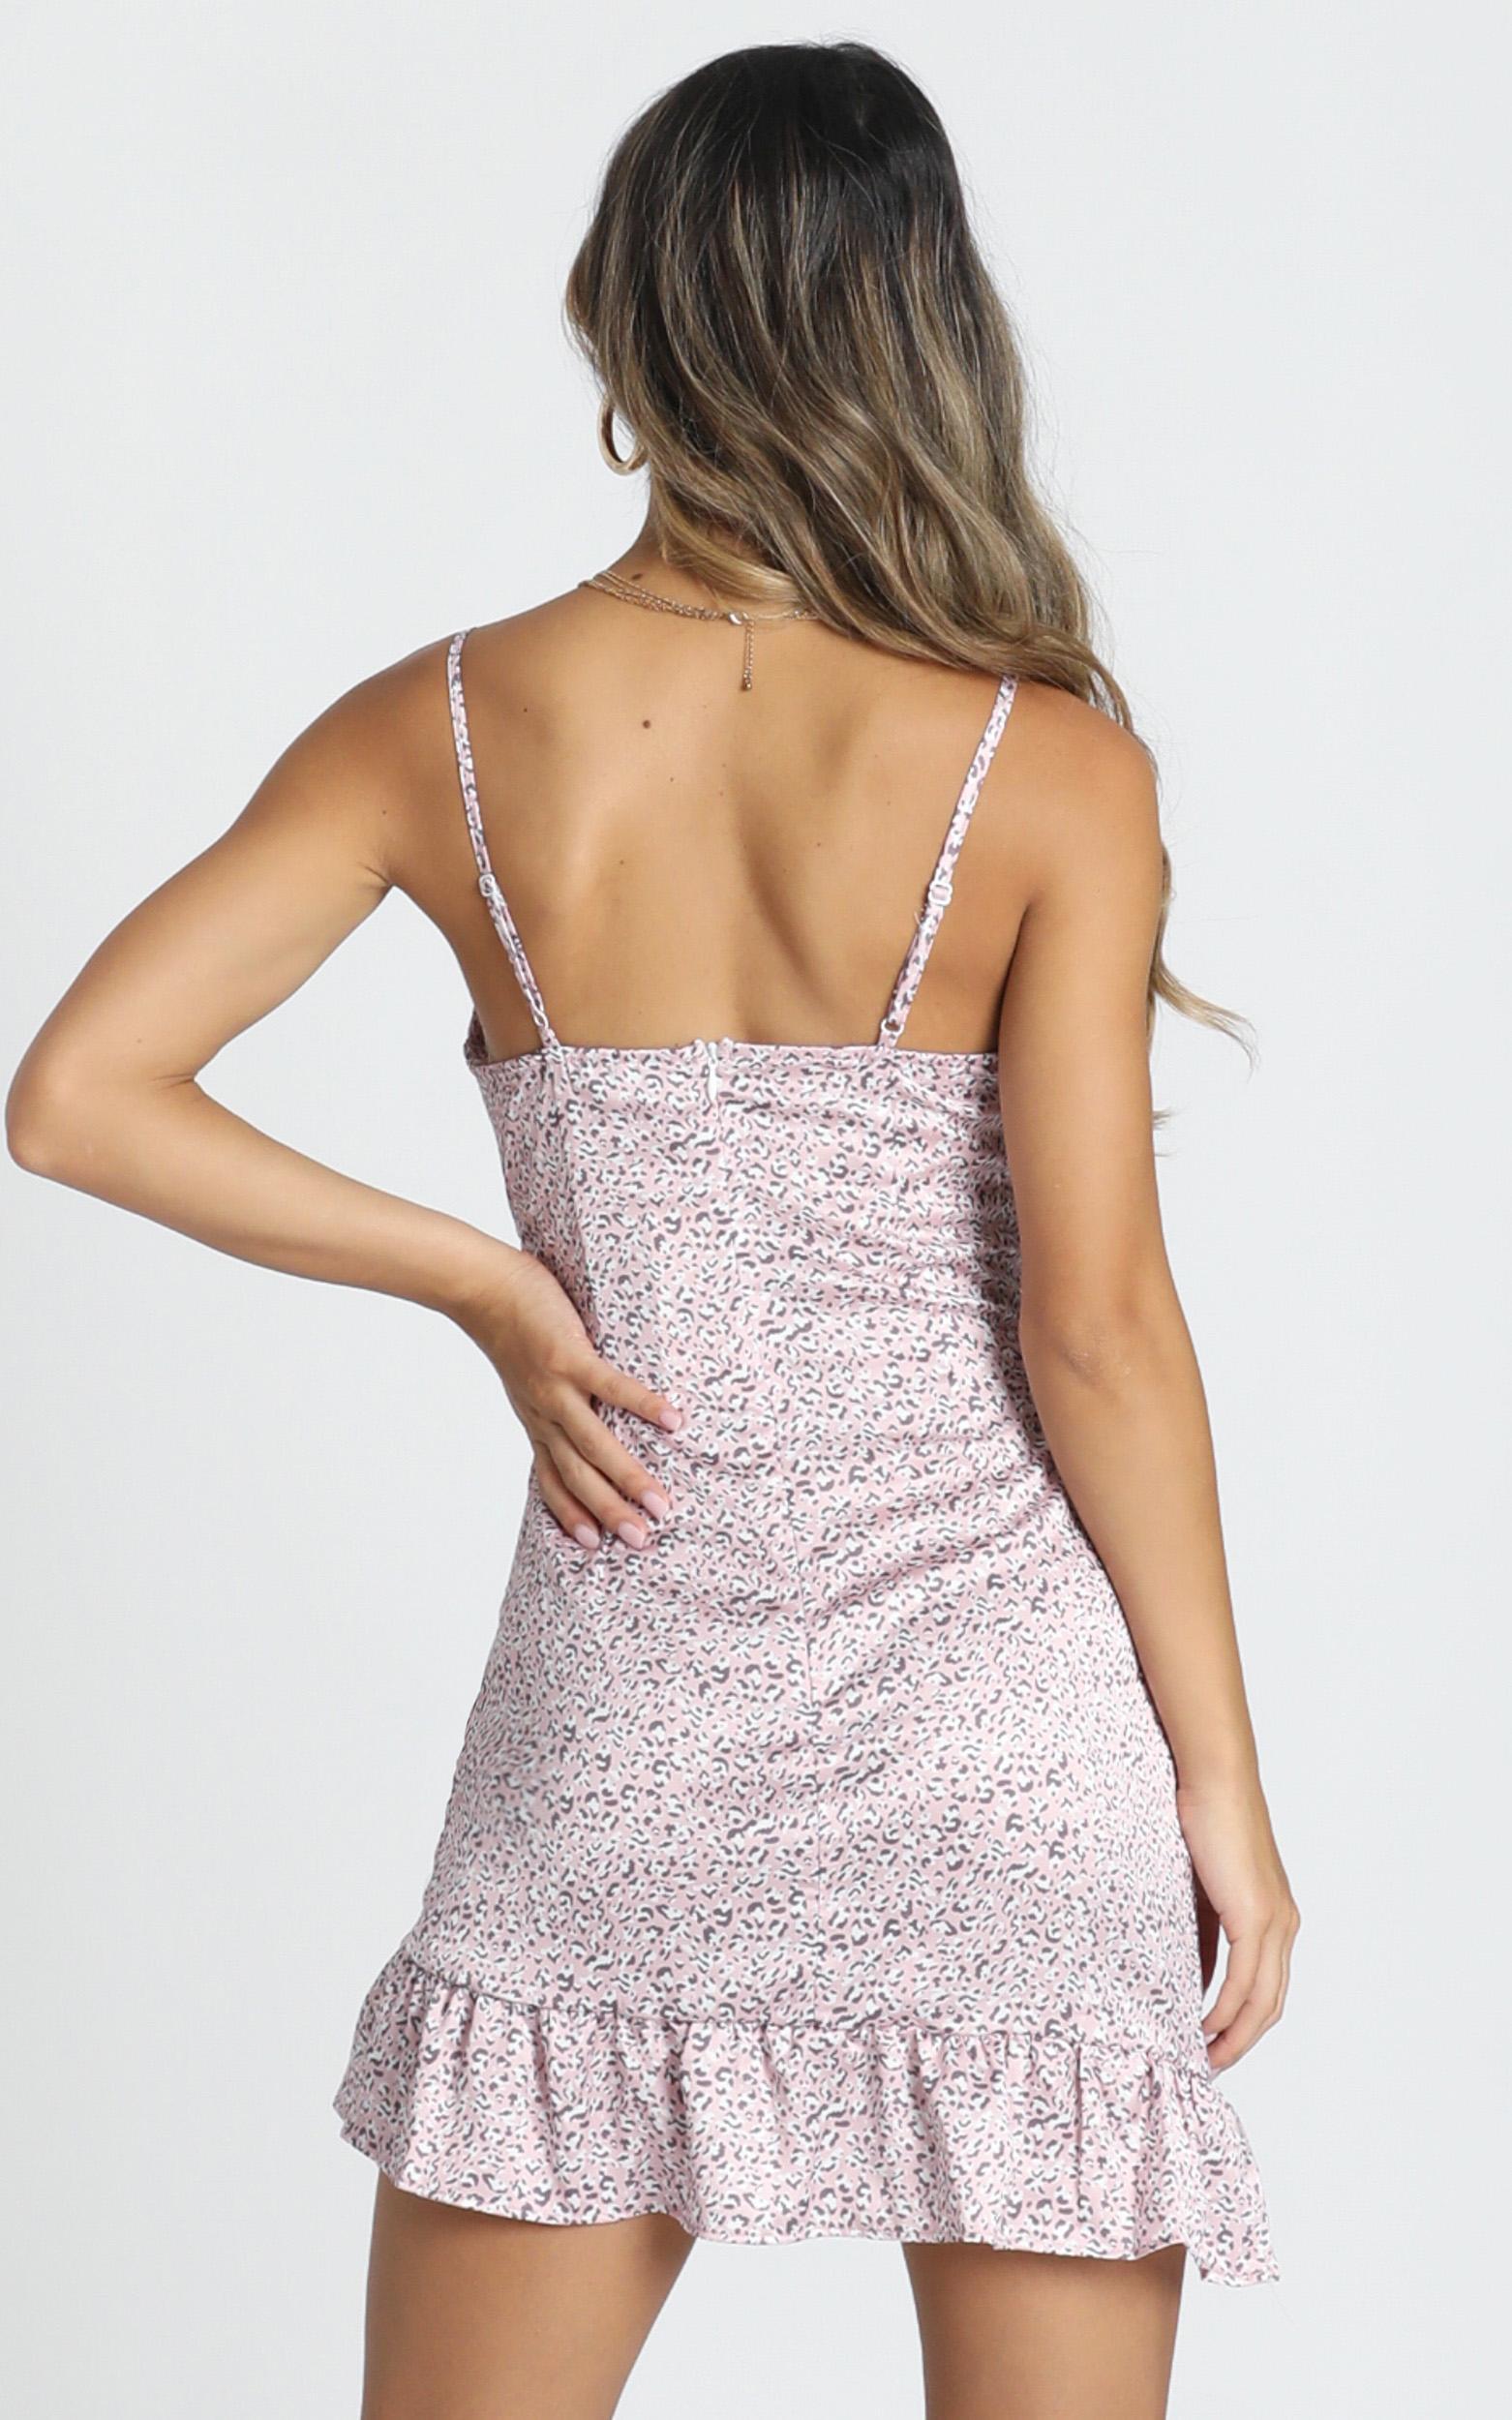 Emelia Frill Satin Mini Dress in pink leopard print - 12 (L), Pink, hi-res image number null